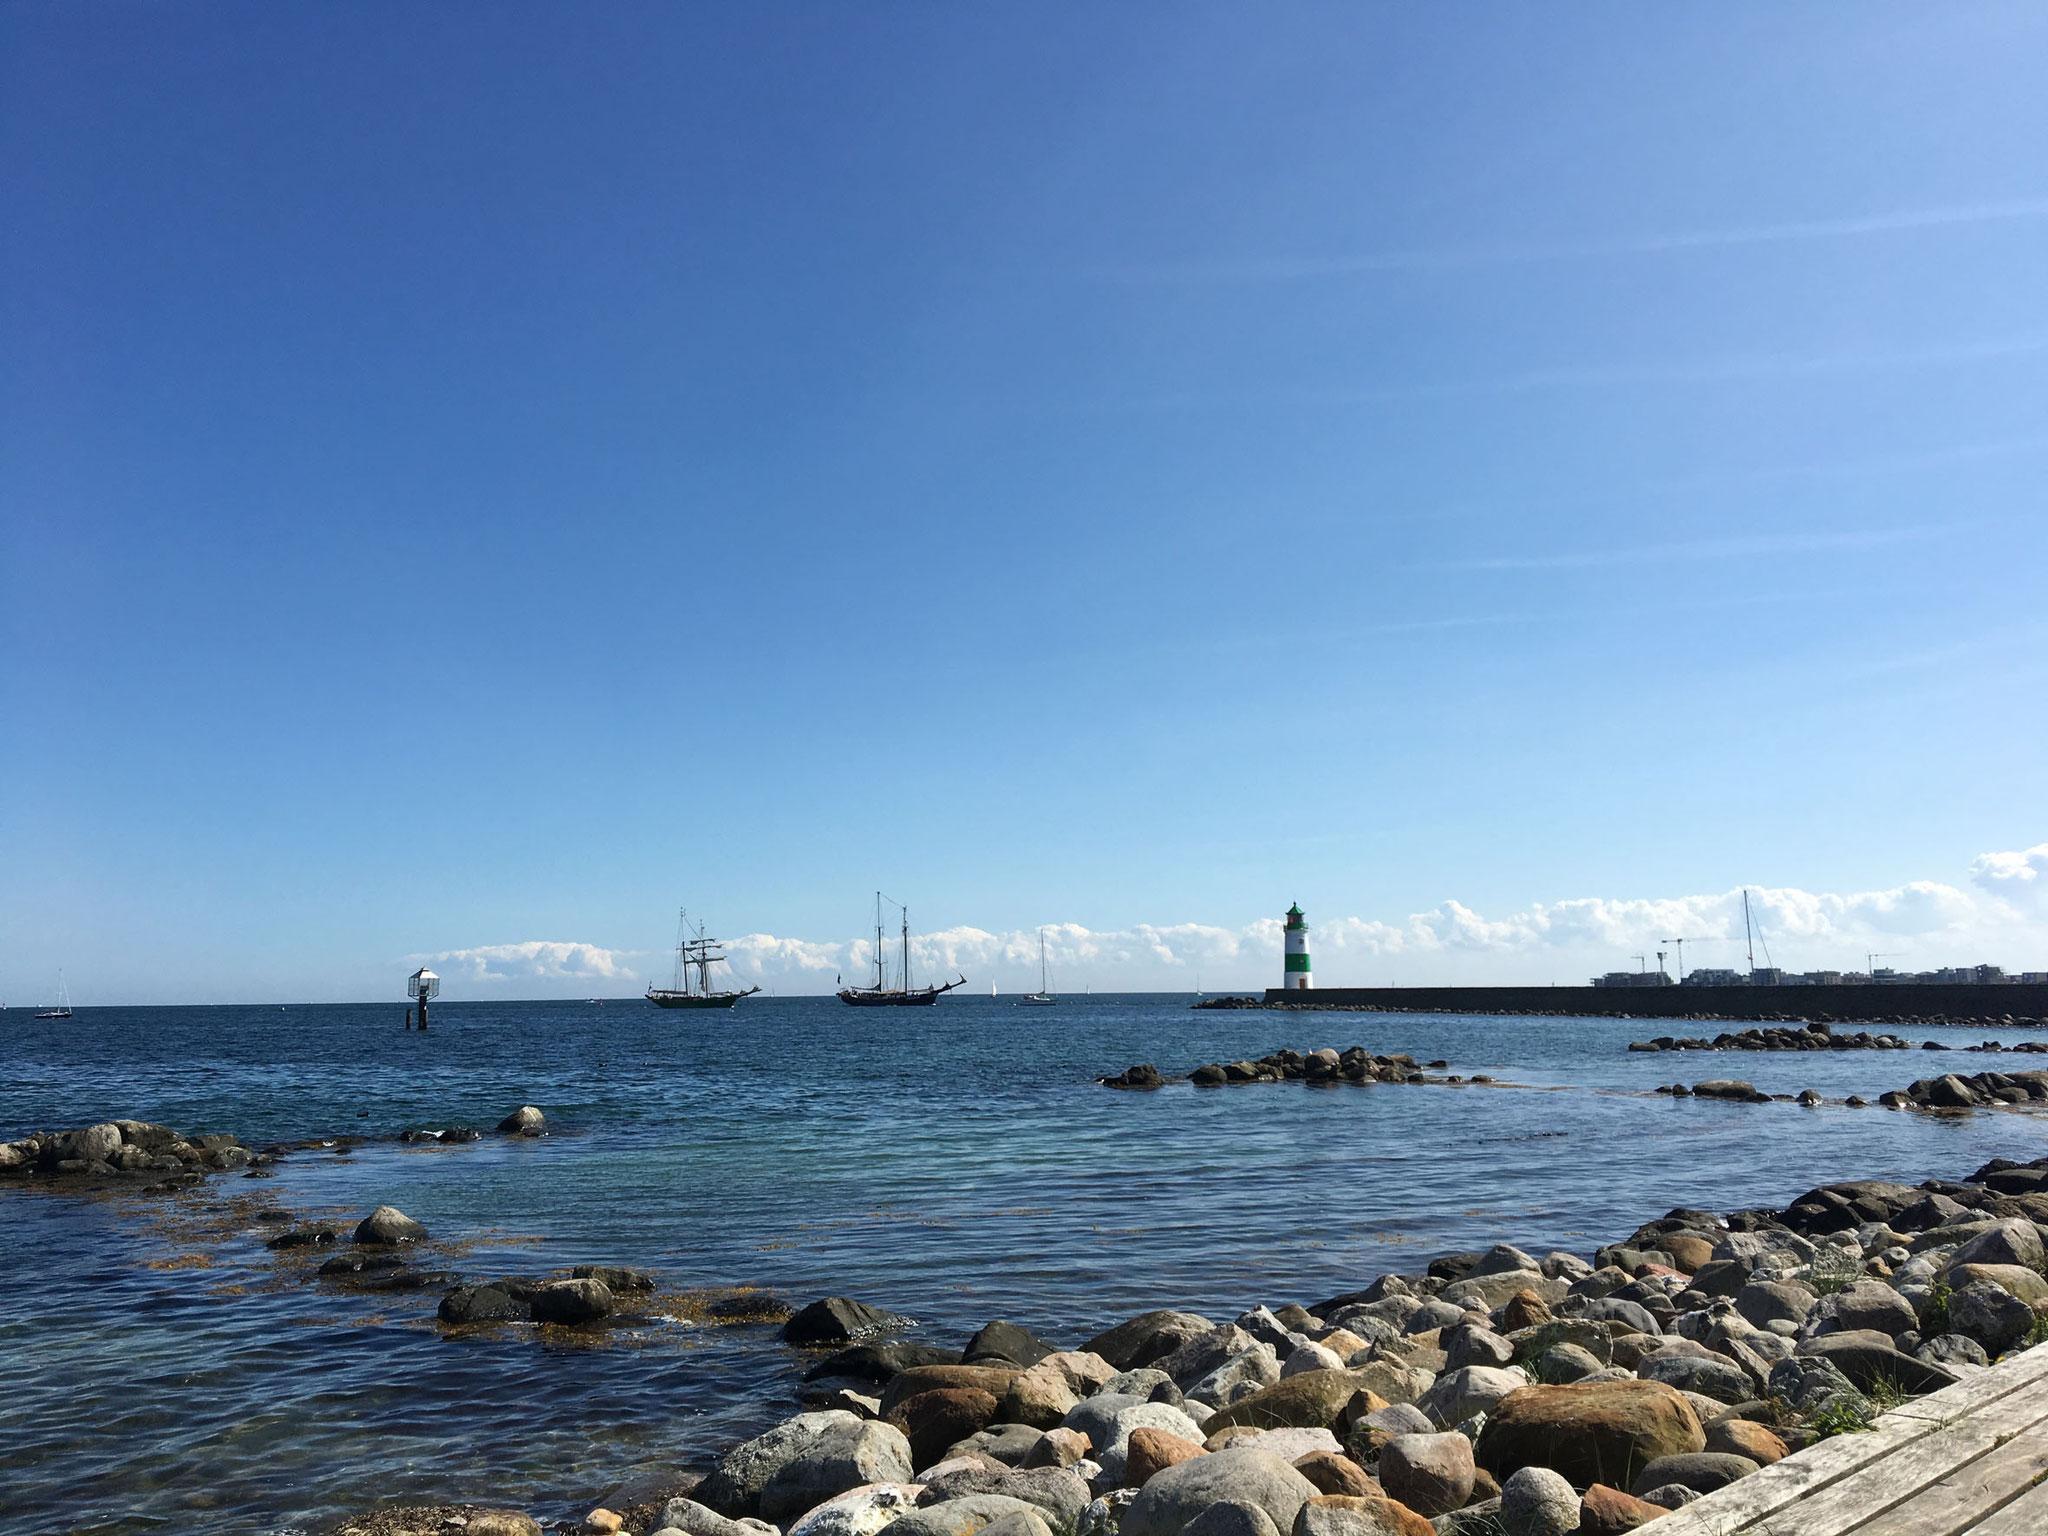 Nachmittags herrlichstes Panorama